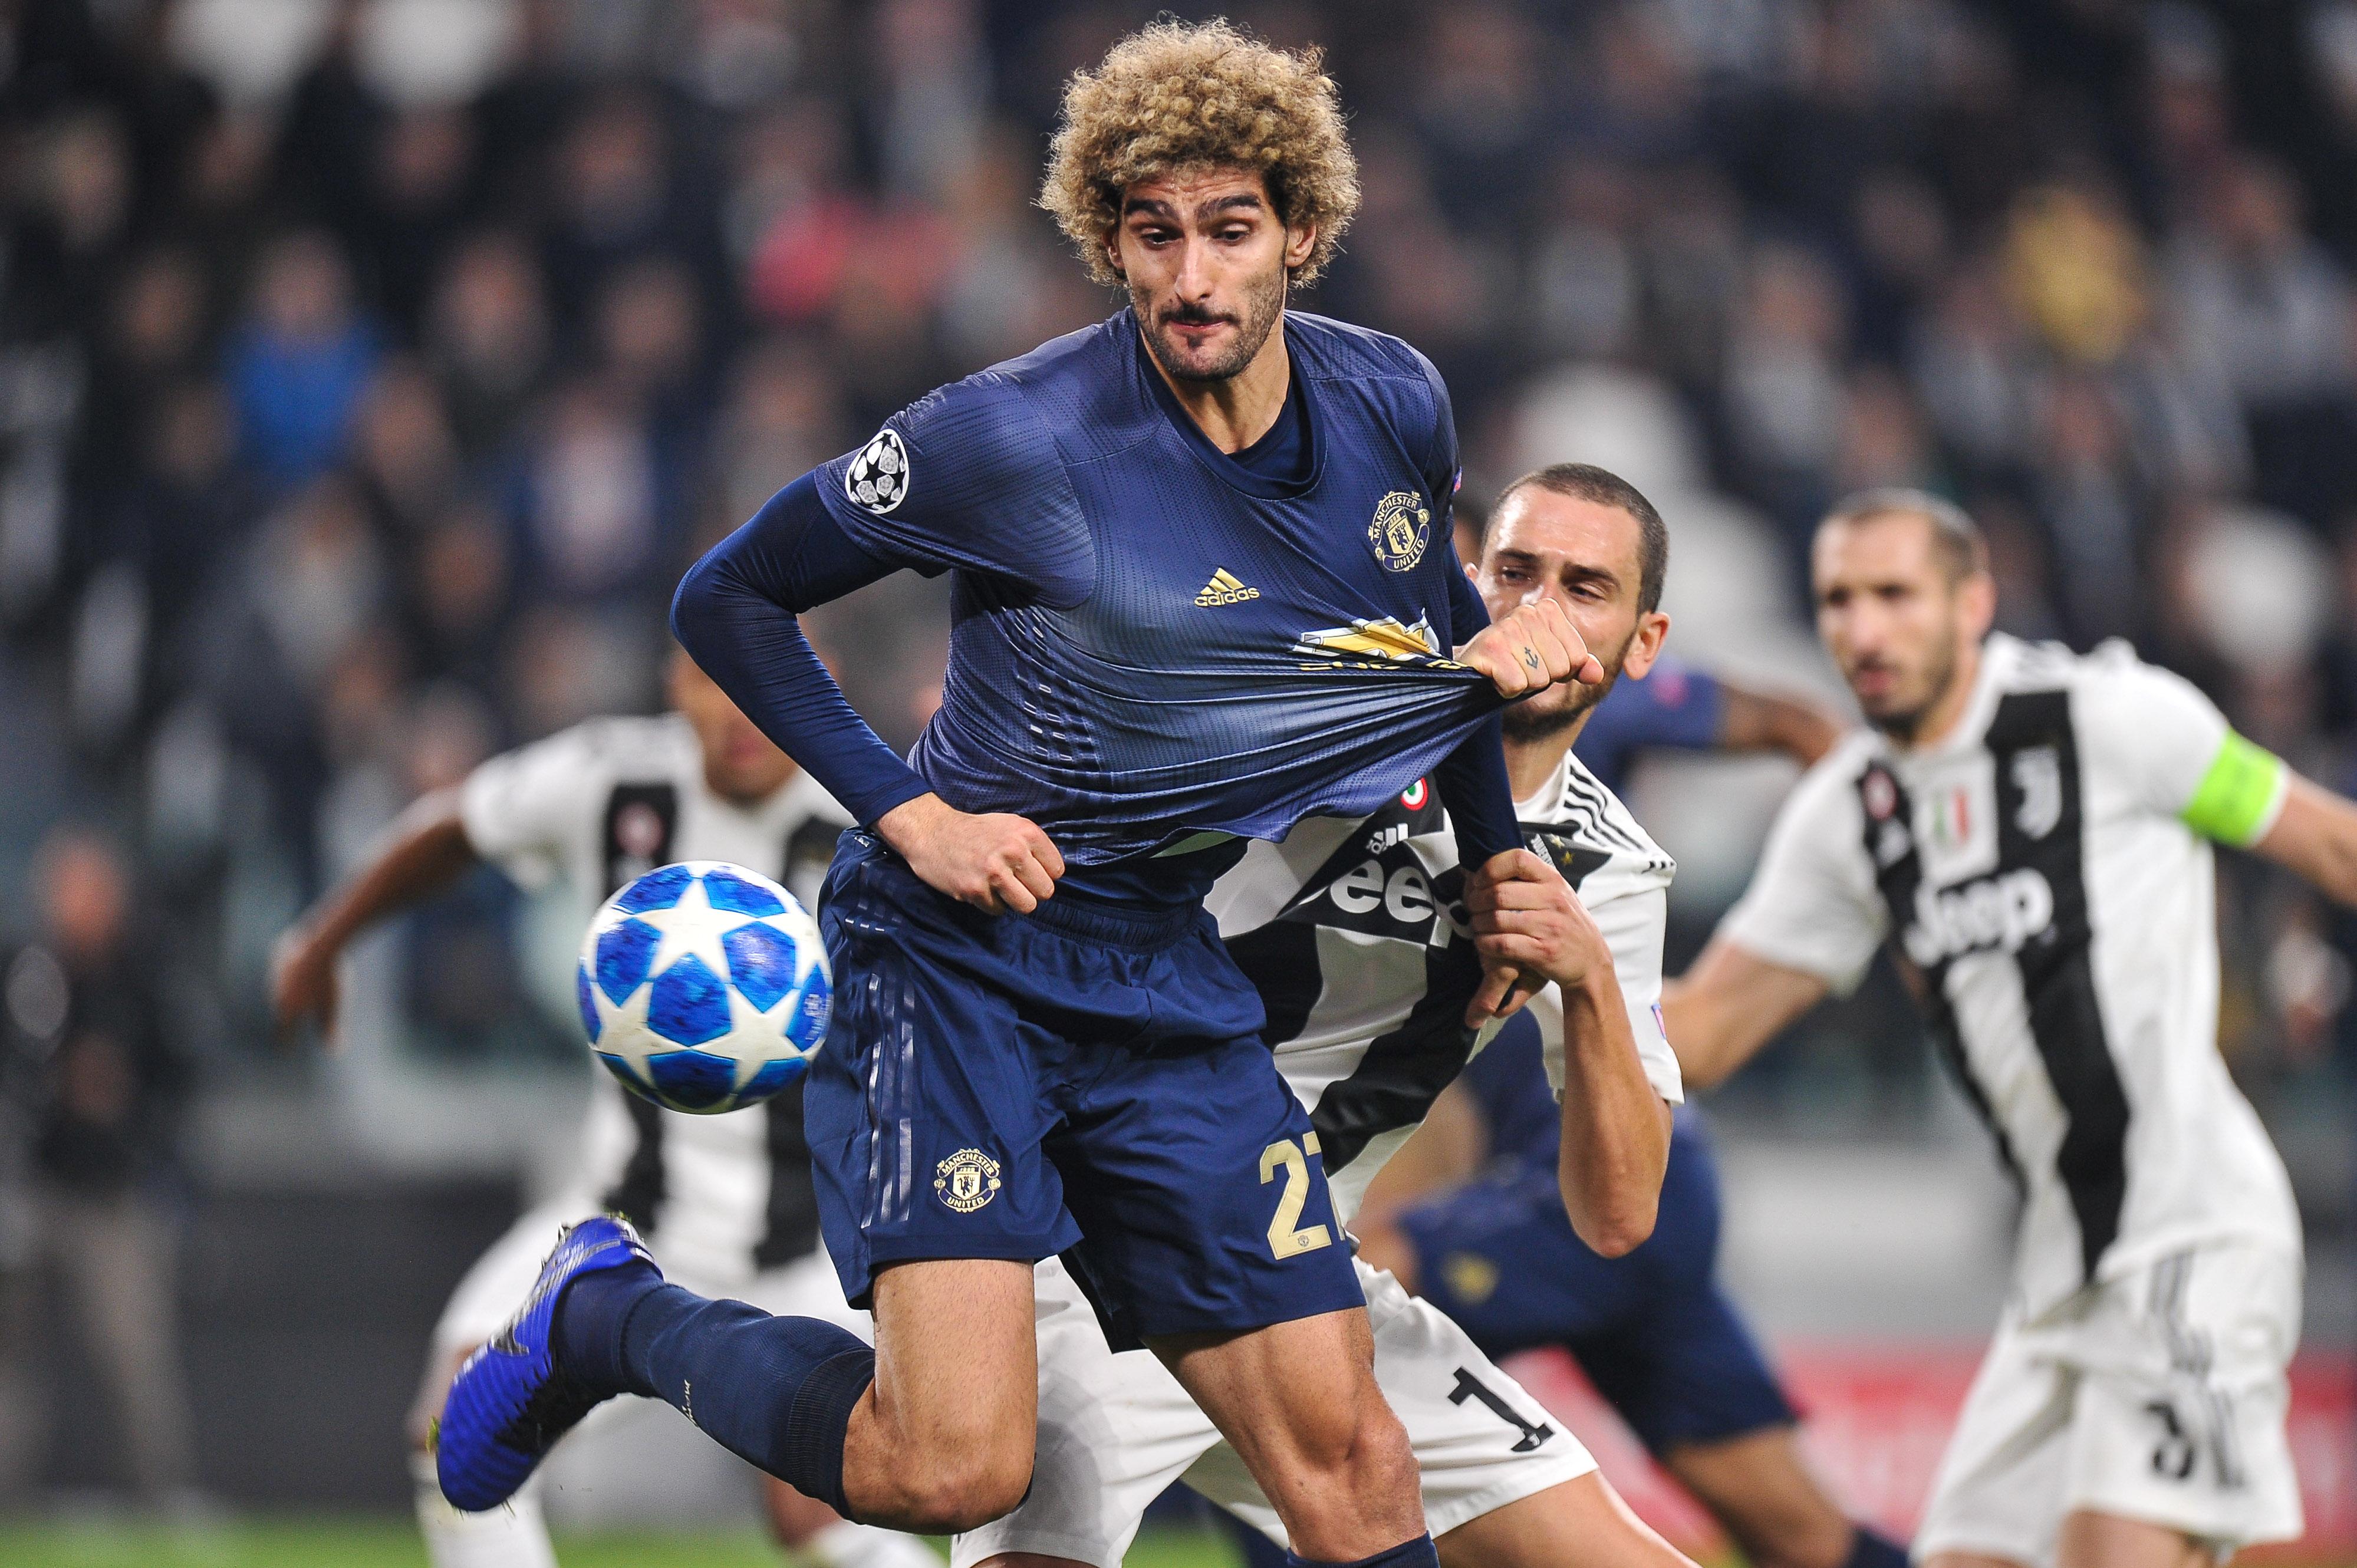 2018.11.07 Turyn, Liga Mistrzow 2018/2019, Juventus Turyn - Manchester United N/z: Marouane Fellaini, Foto Lukasz Laskowski / PressFocus